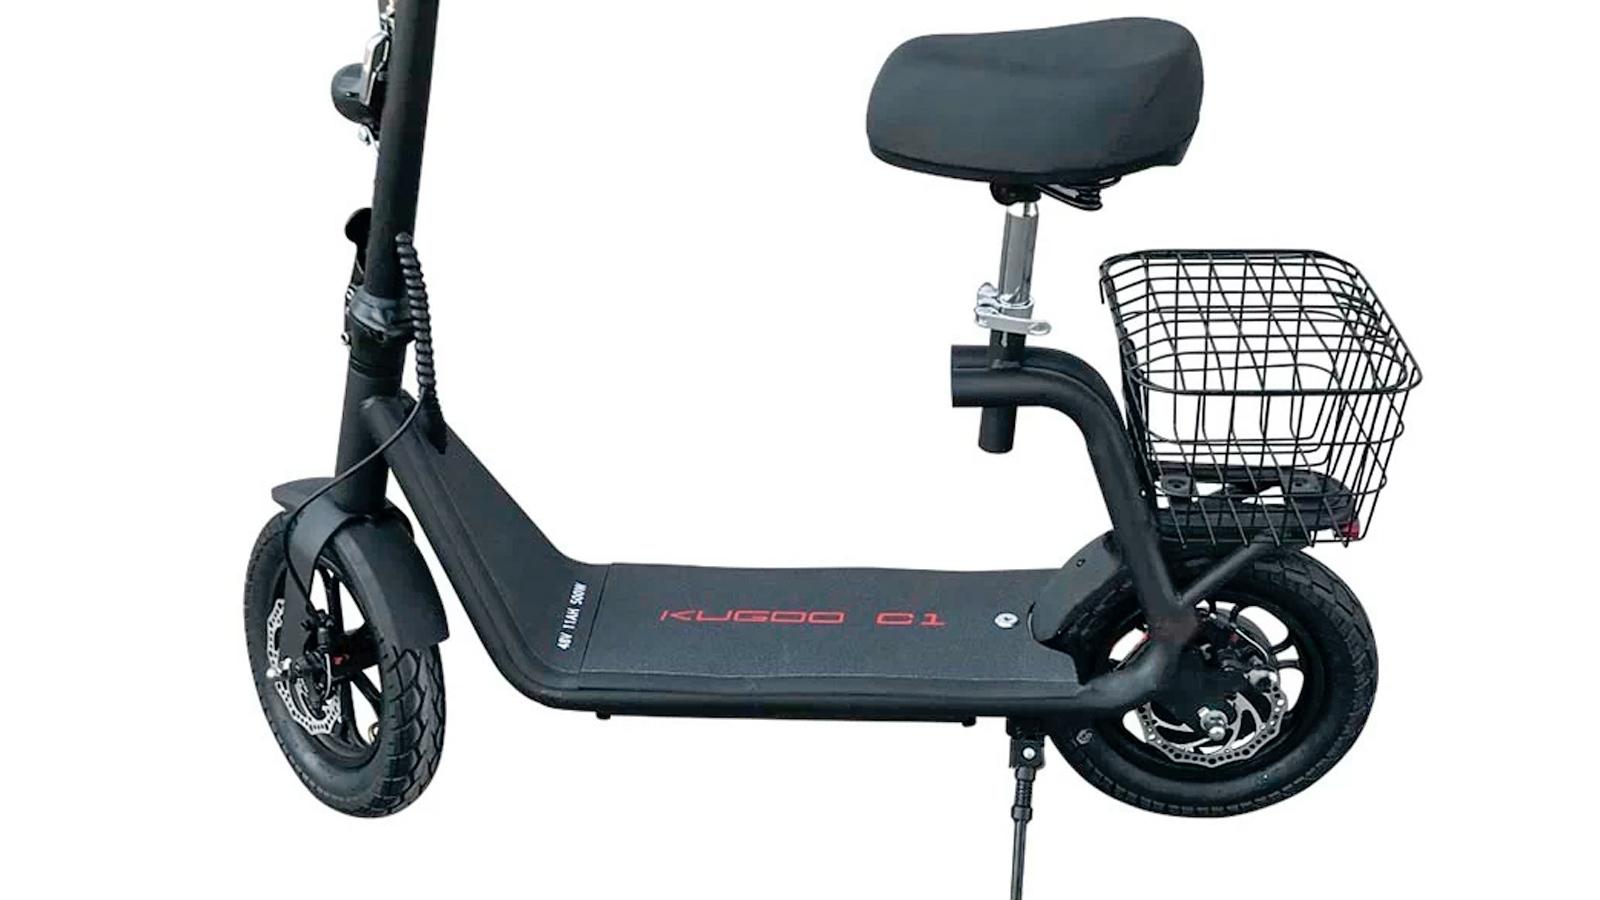 поворот переднего колеса электросамоката